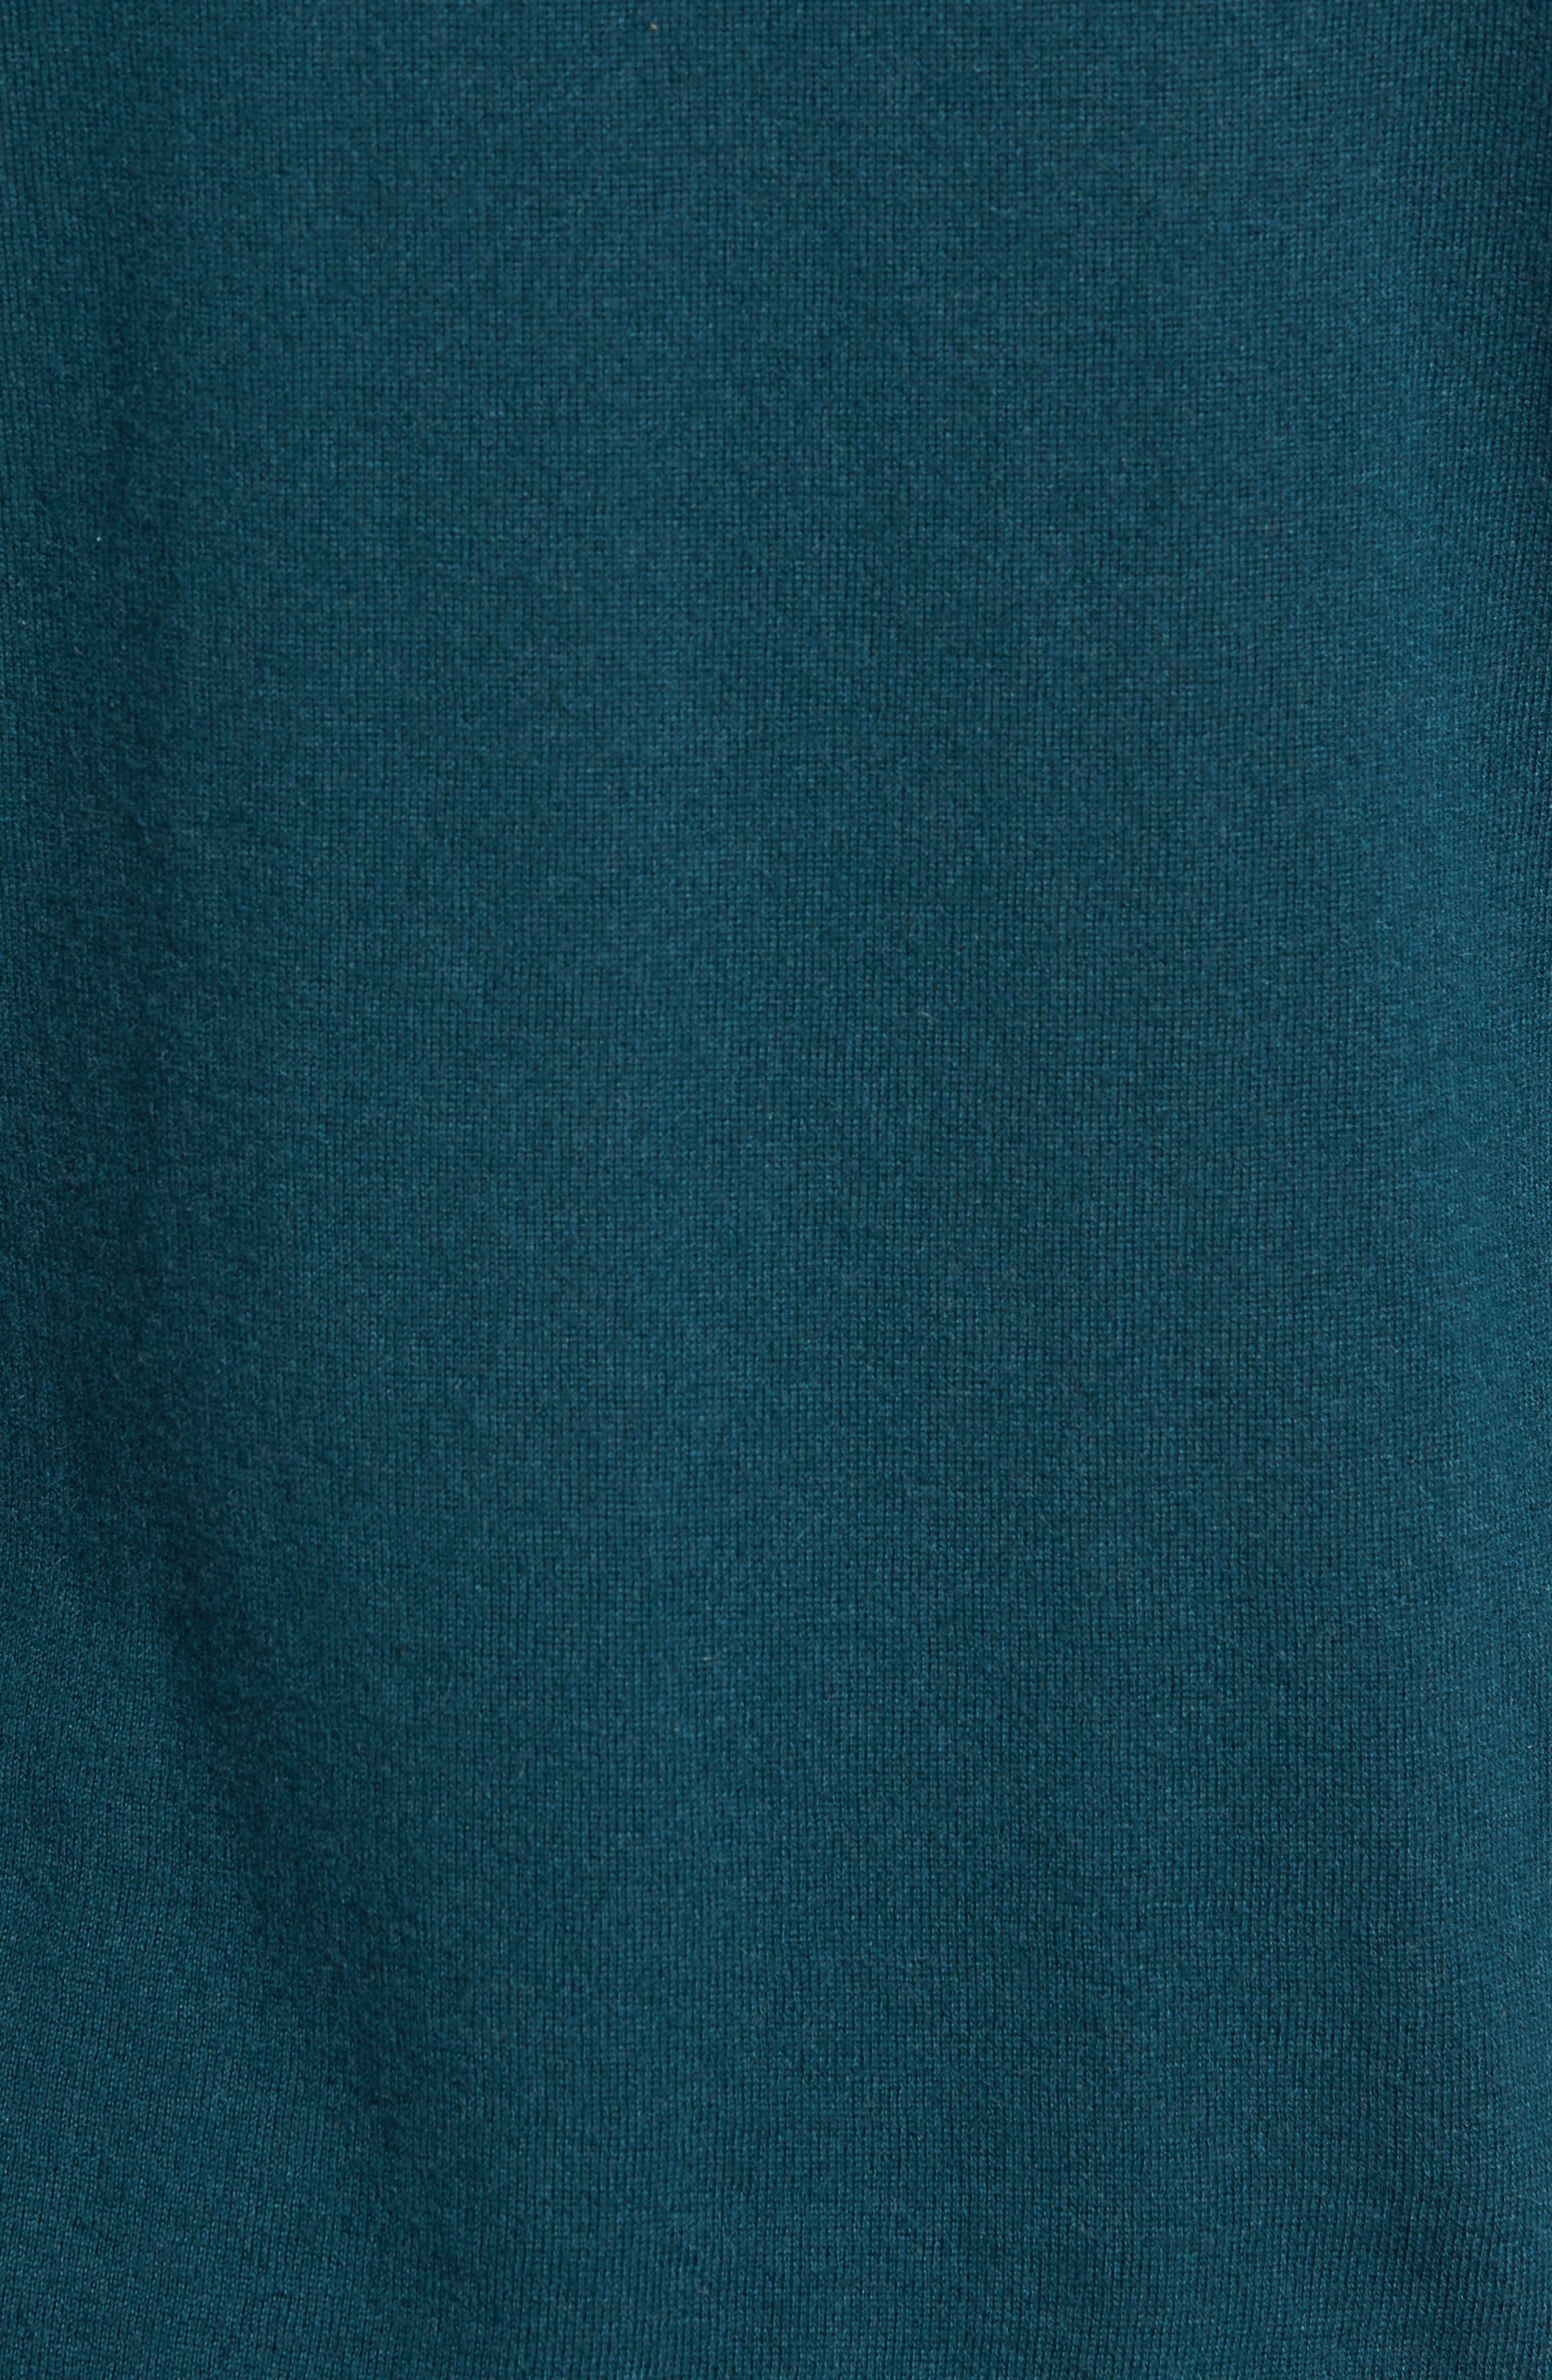 Cashmere Sweater,                             Alternate thumbnail 5, color,                             PETROL